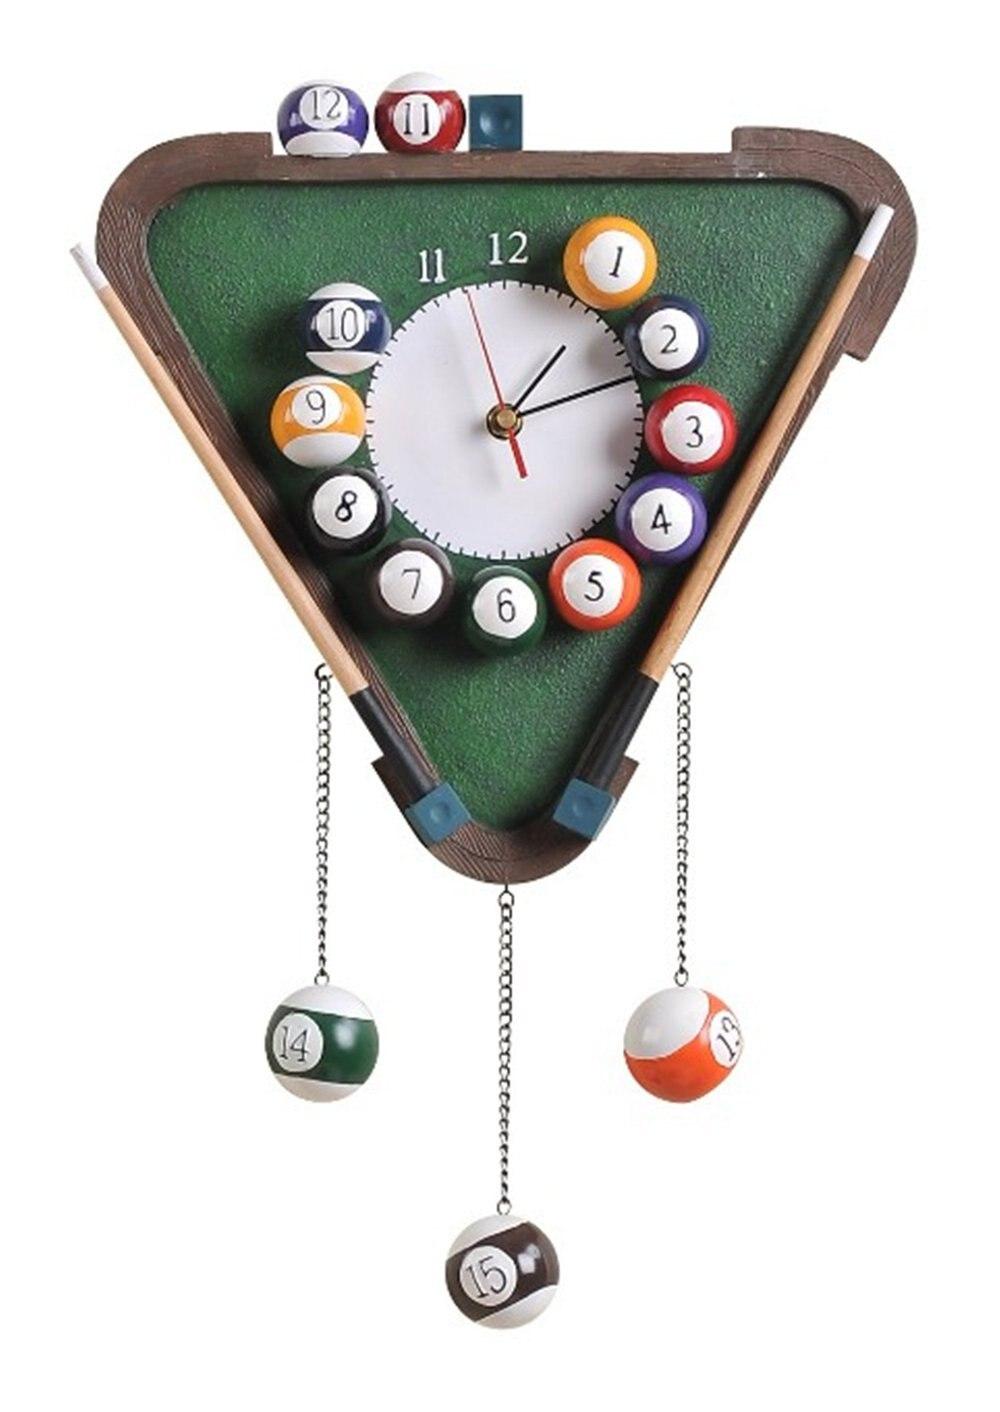 Novelty European Style Vintage Fashion Home Decor Table Tennis Wall Clock